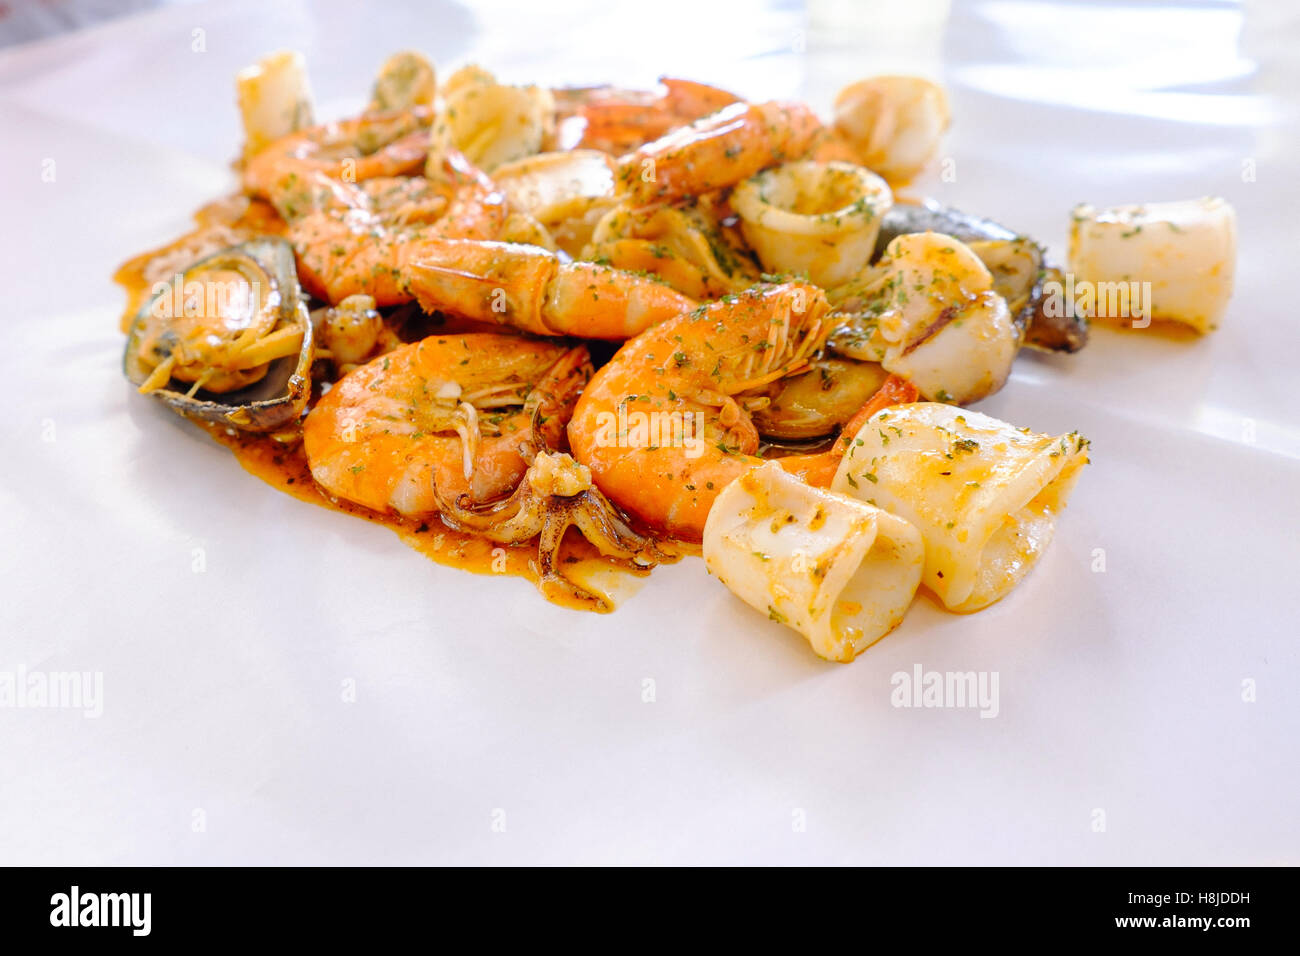 seafood, fresh, food, sea, lobster, oysters, background, octopus, shellfish, menu, fish, lemon, overhead, steamed, - Stock Image